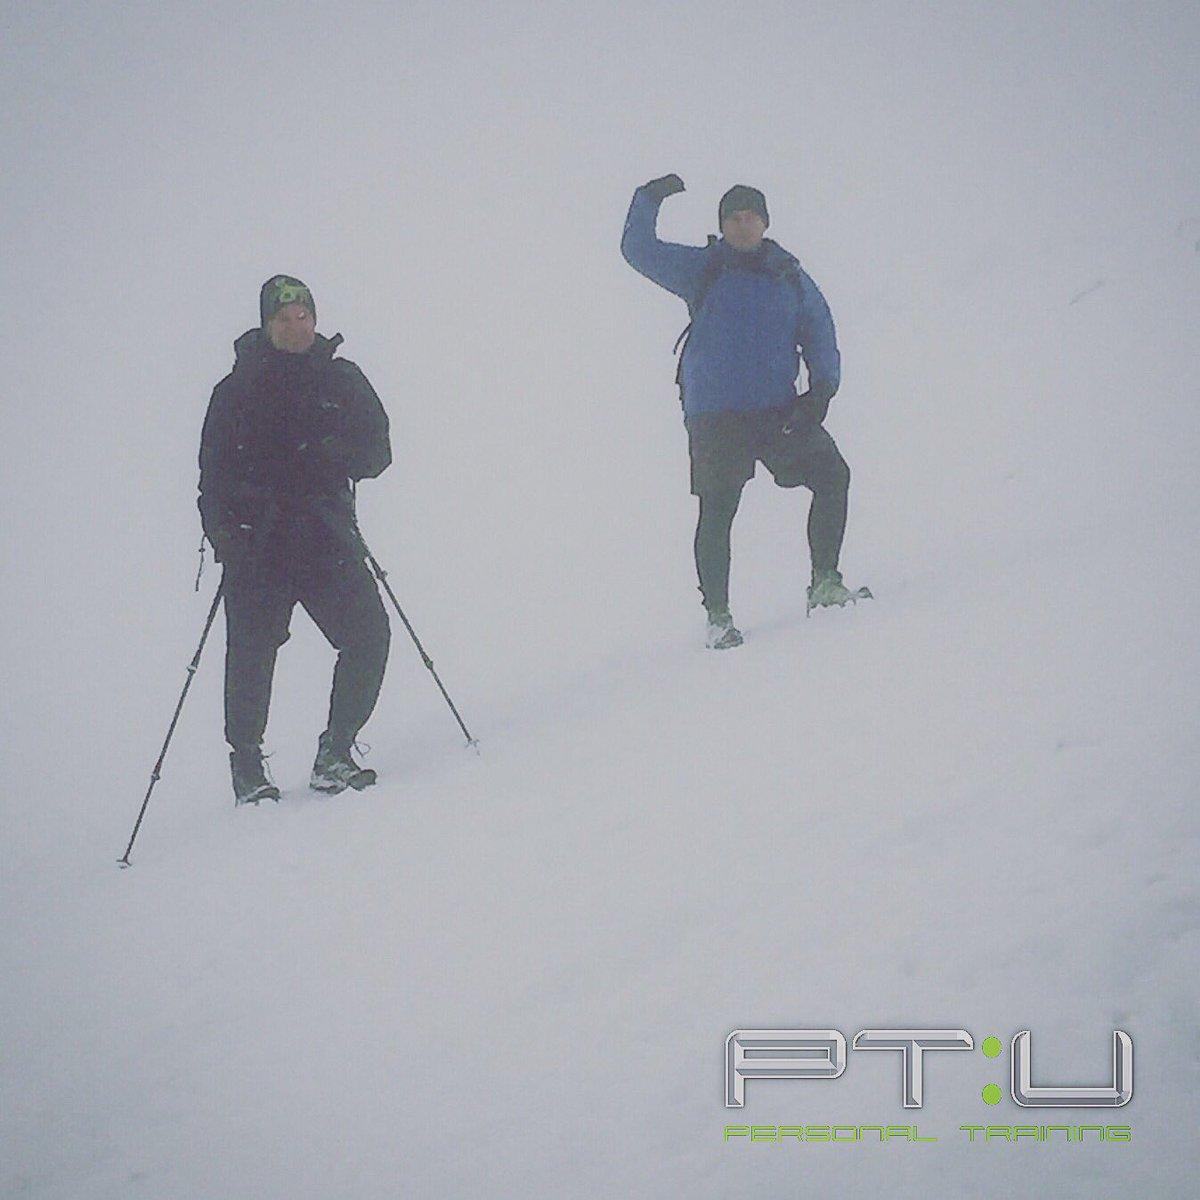 Team_PTU photo